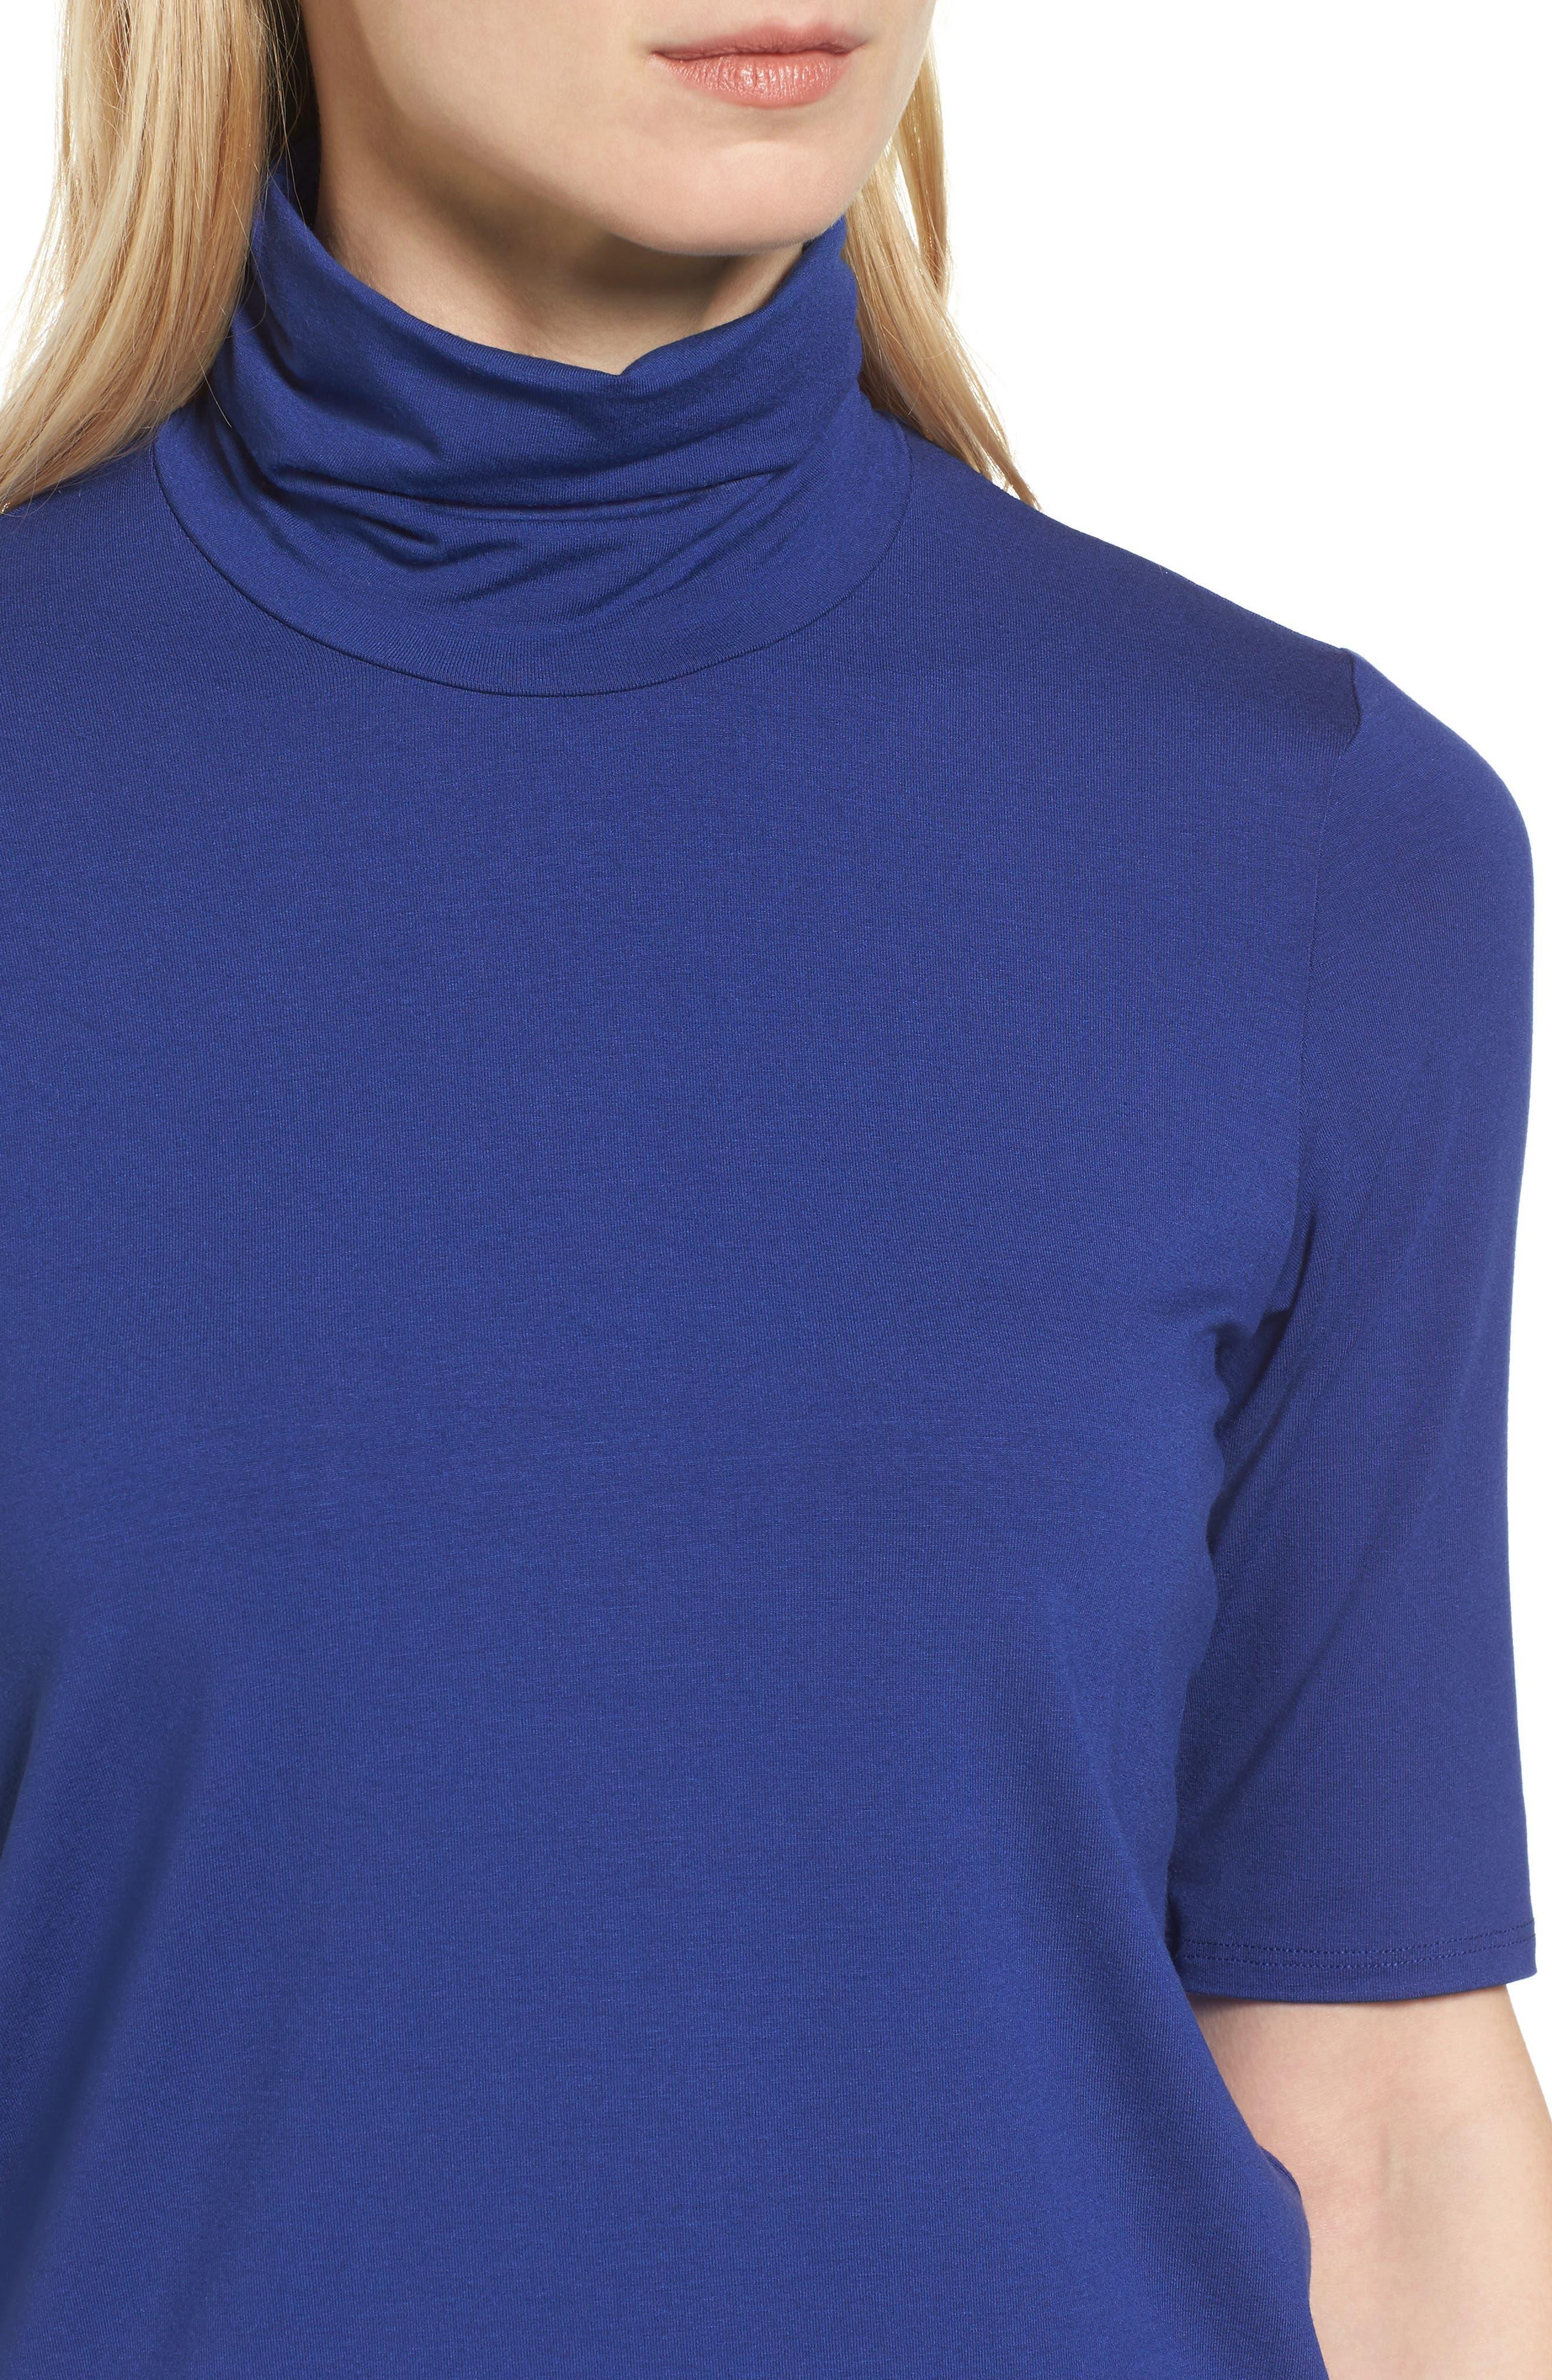 Alternate Image 4  - Eileen Fisher Scrunch Neck Jersey Top (Regular & Petite)